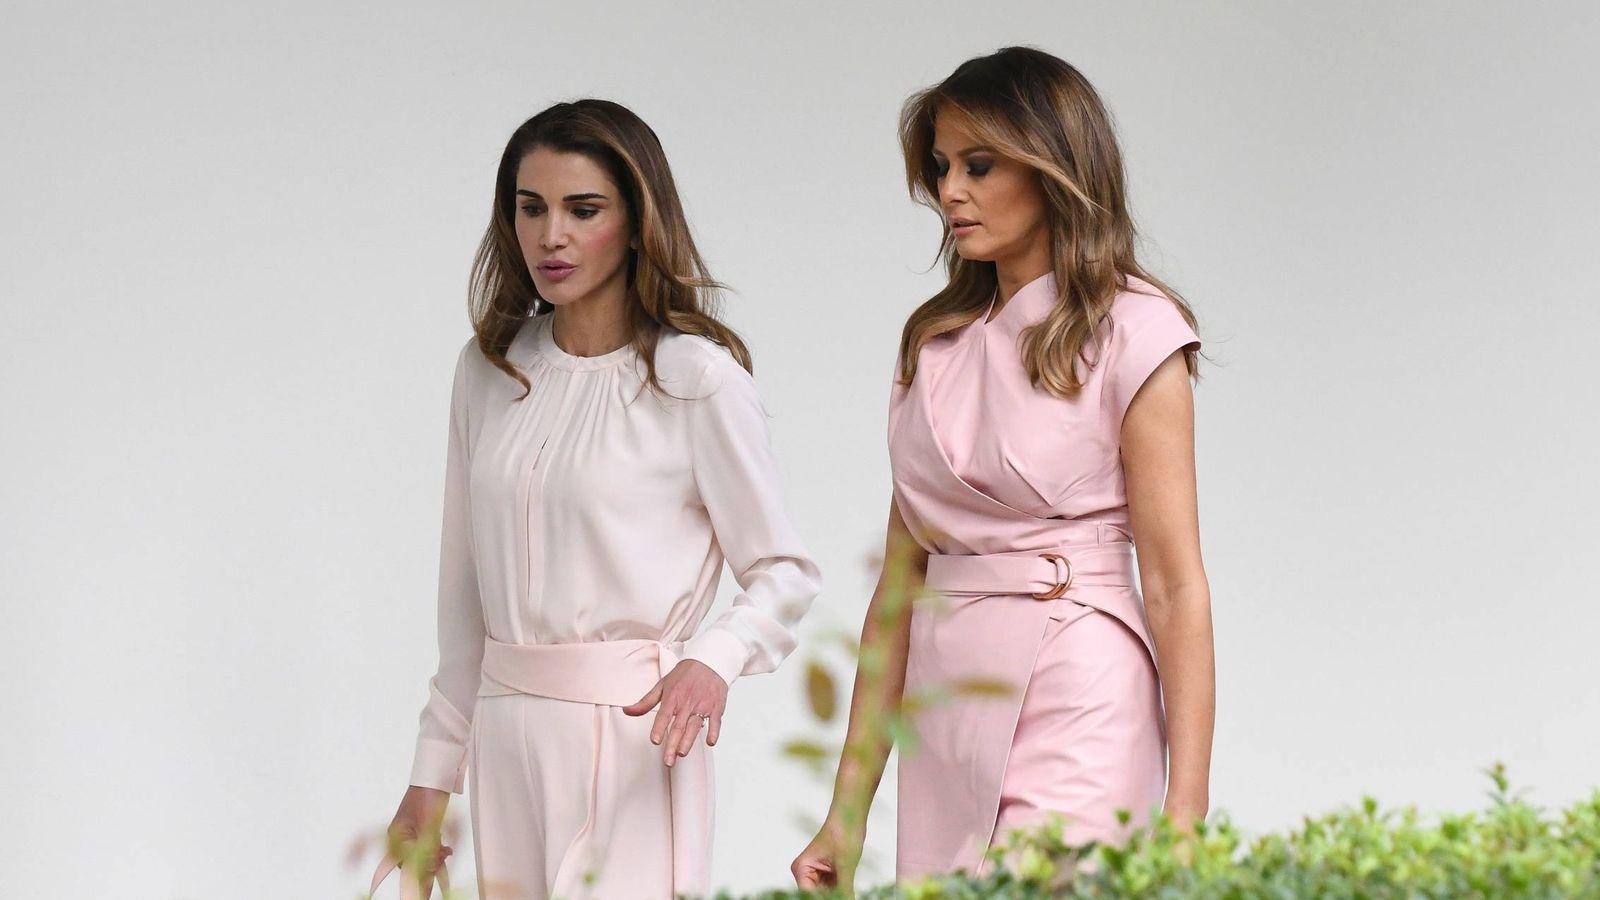 Foto: Rania de Jordania y Melania Trump. (Gtresonline)